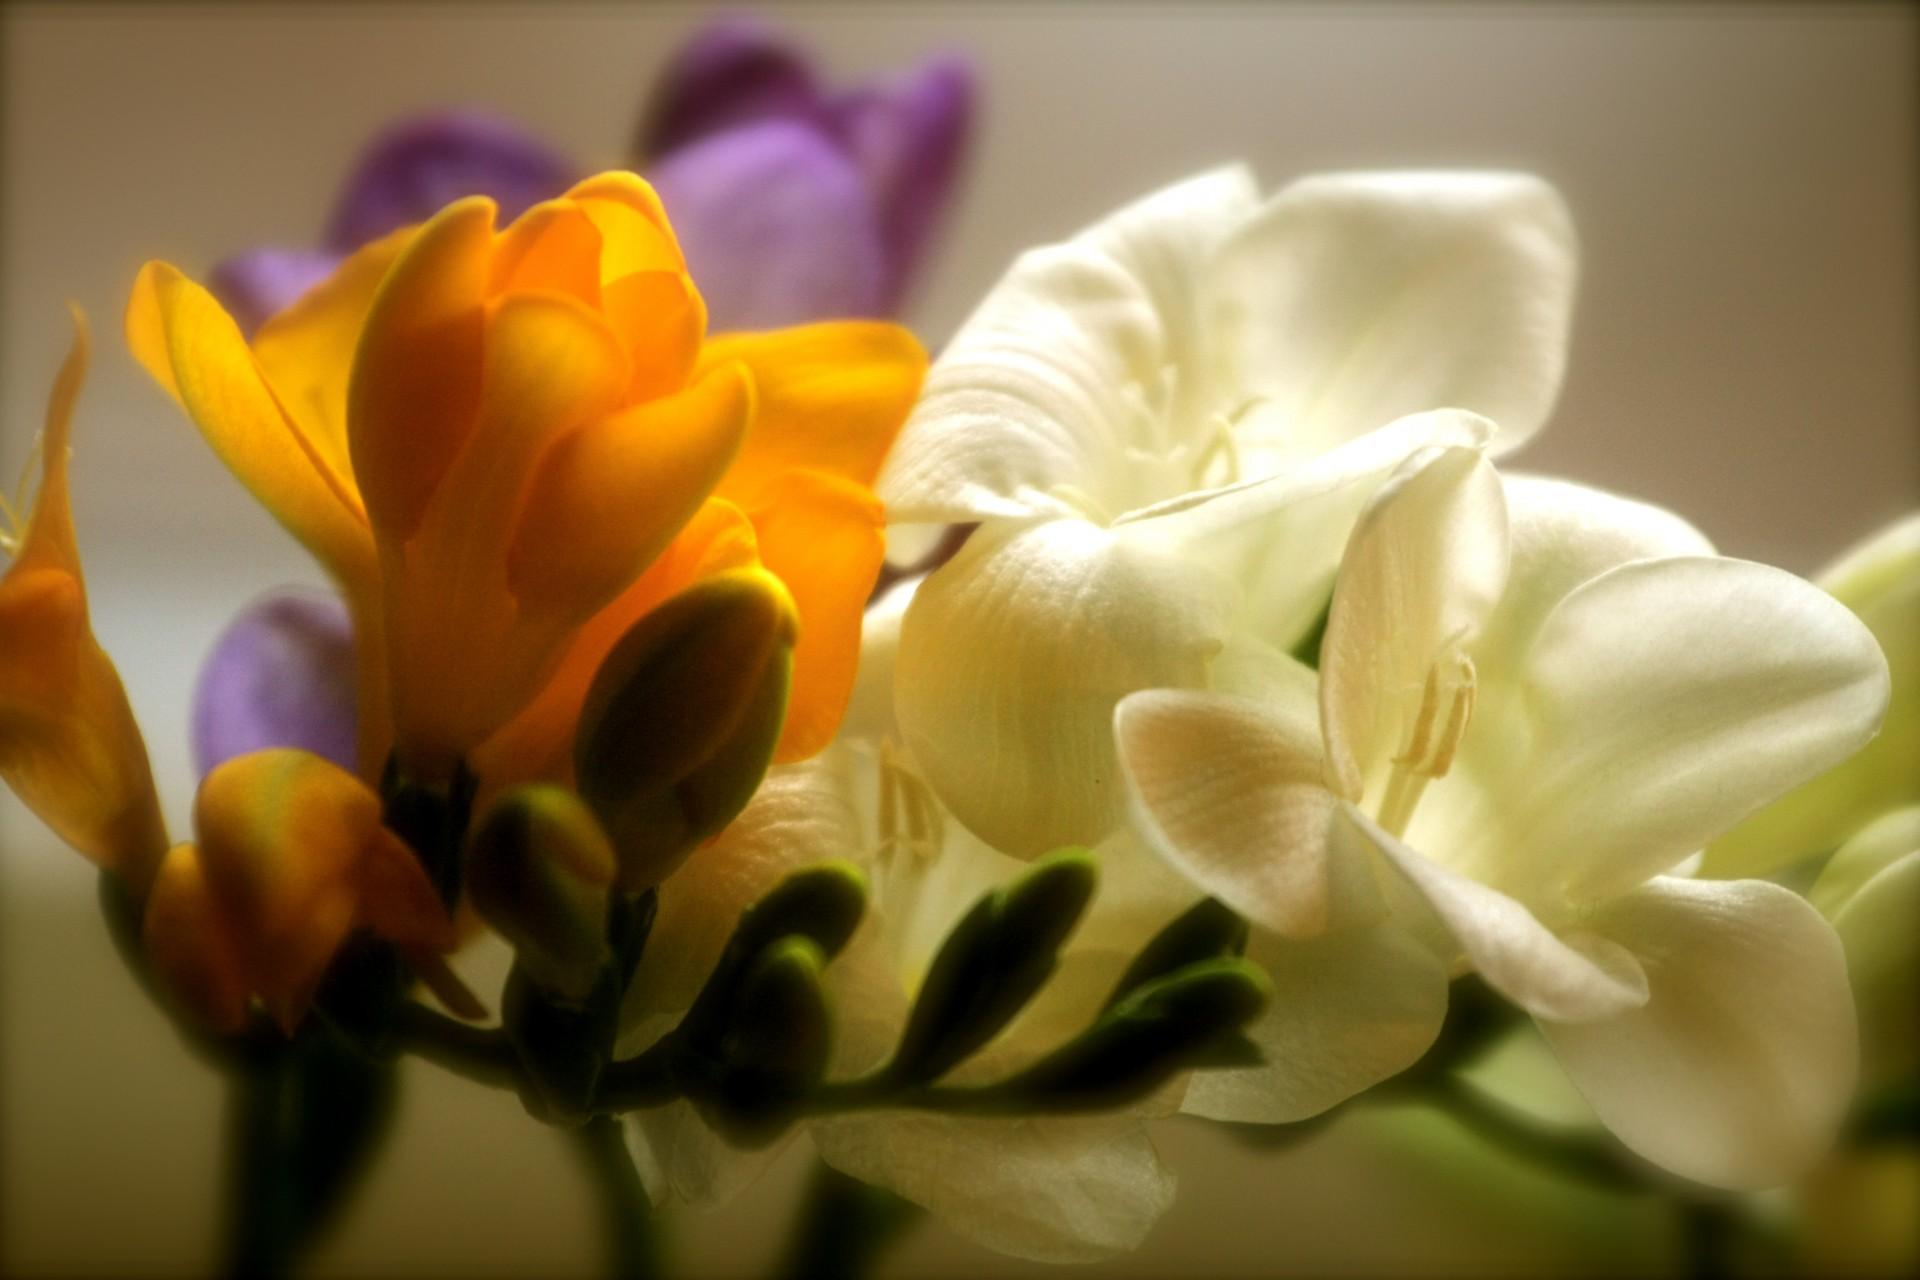 Картинка цветка фрезия